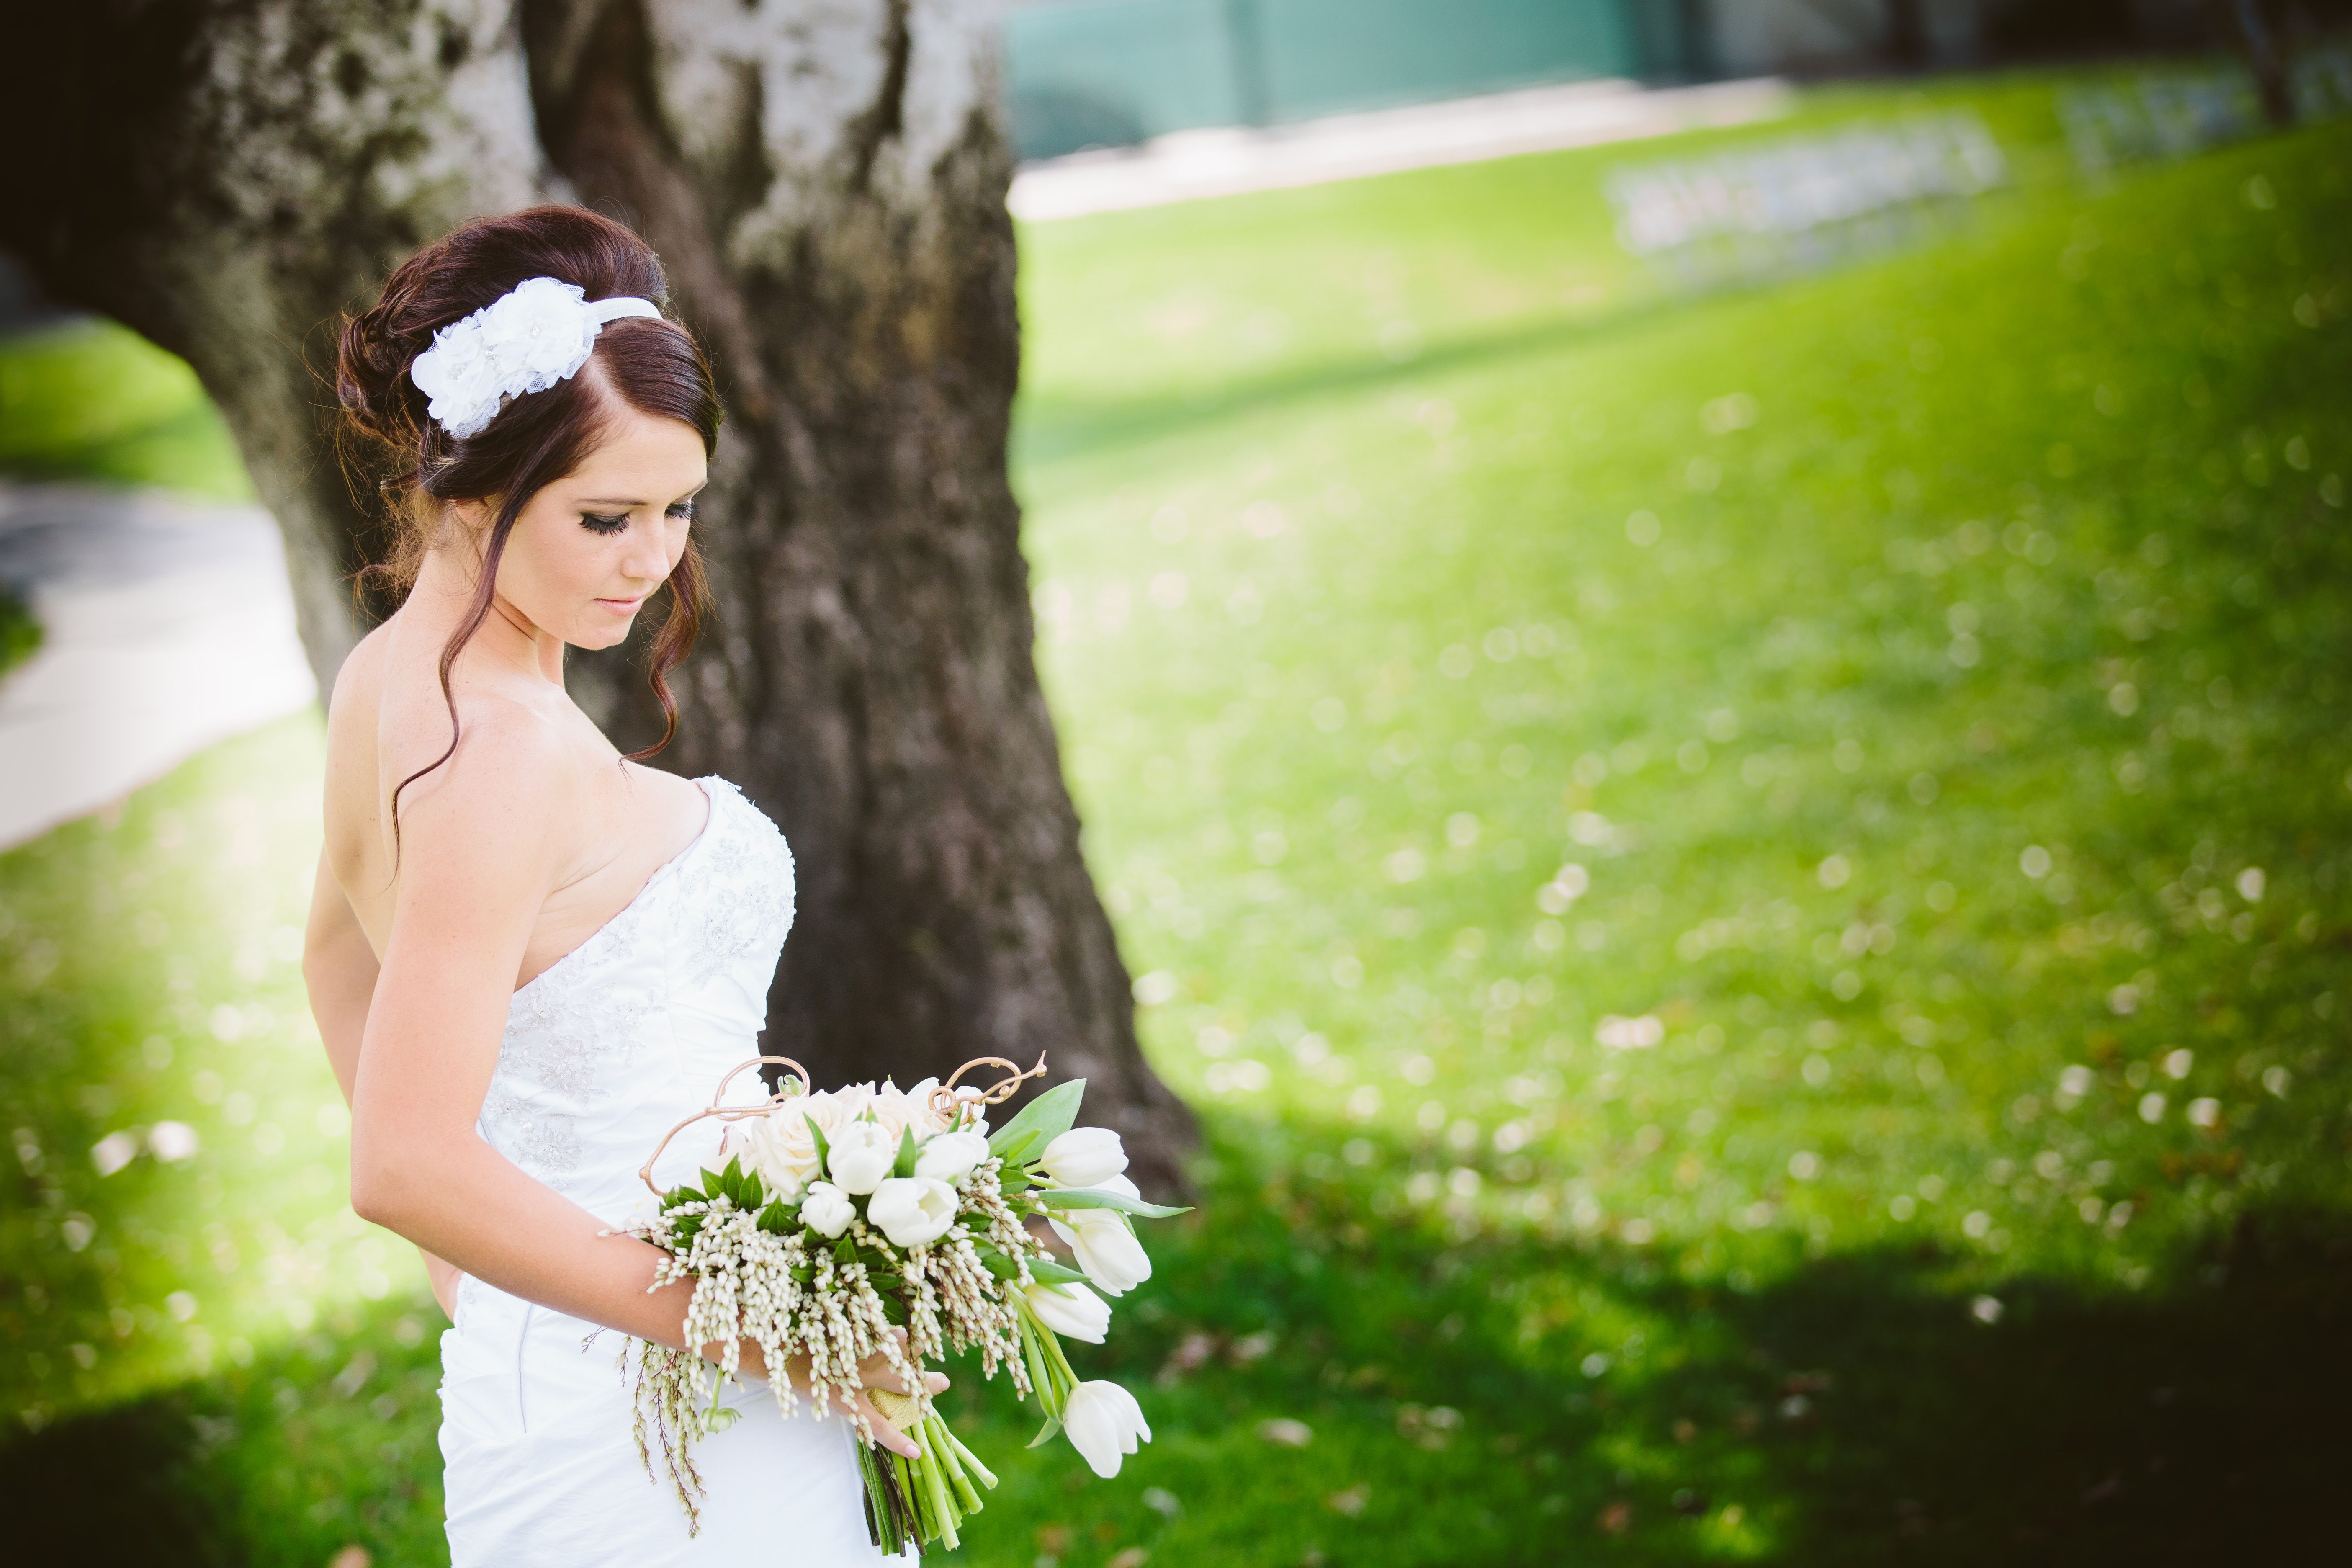 Wedding Gallery 4 Jpg 5618 3745